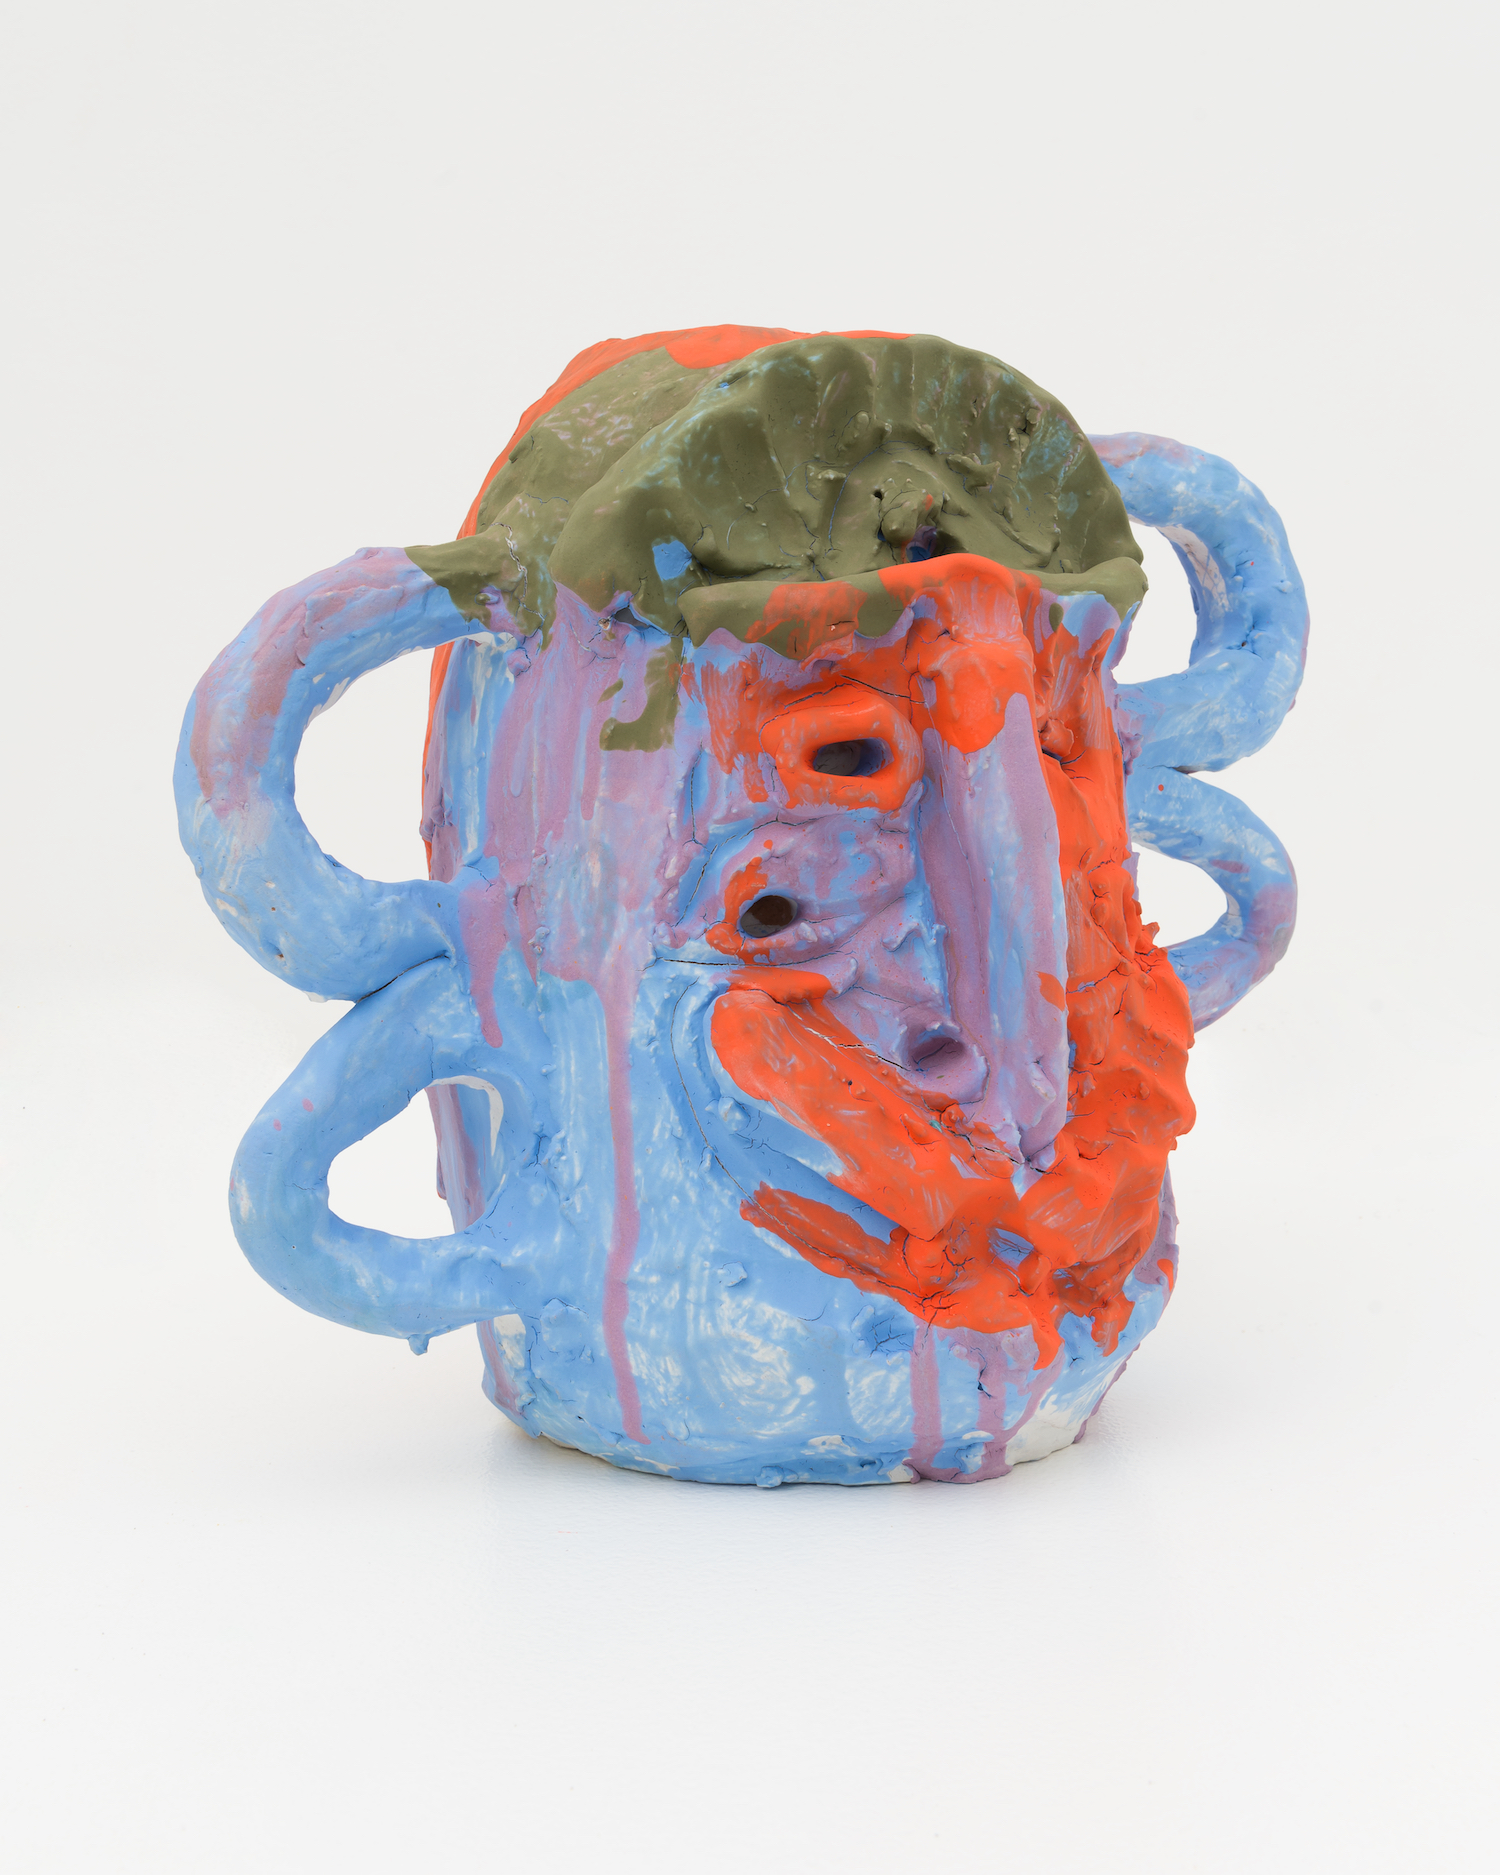 William J. O'Brien  Untitled  2015 Glazed ceramic 11h x 13w x 8d in WOB1005